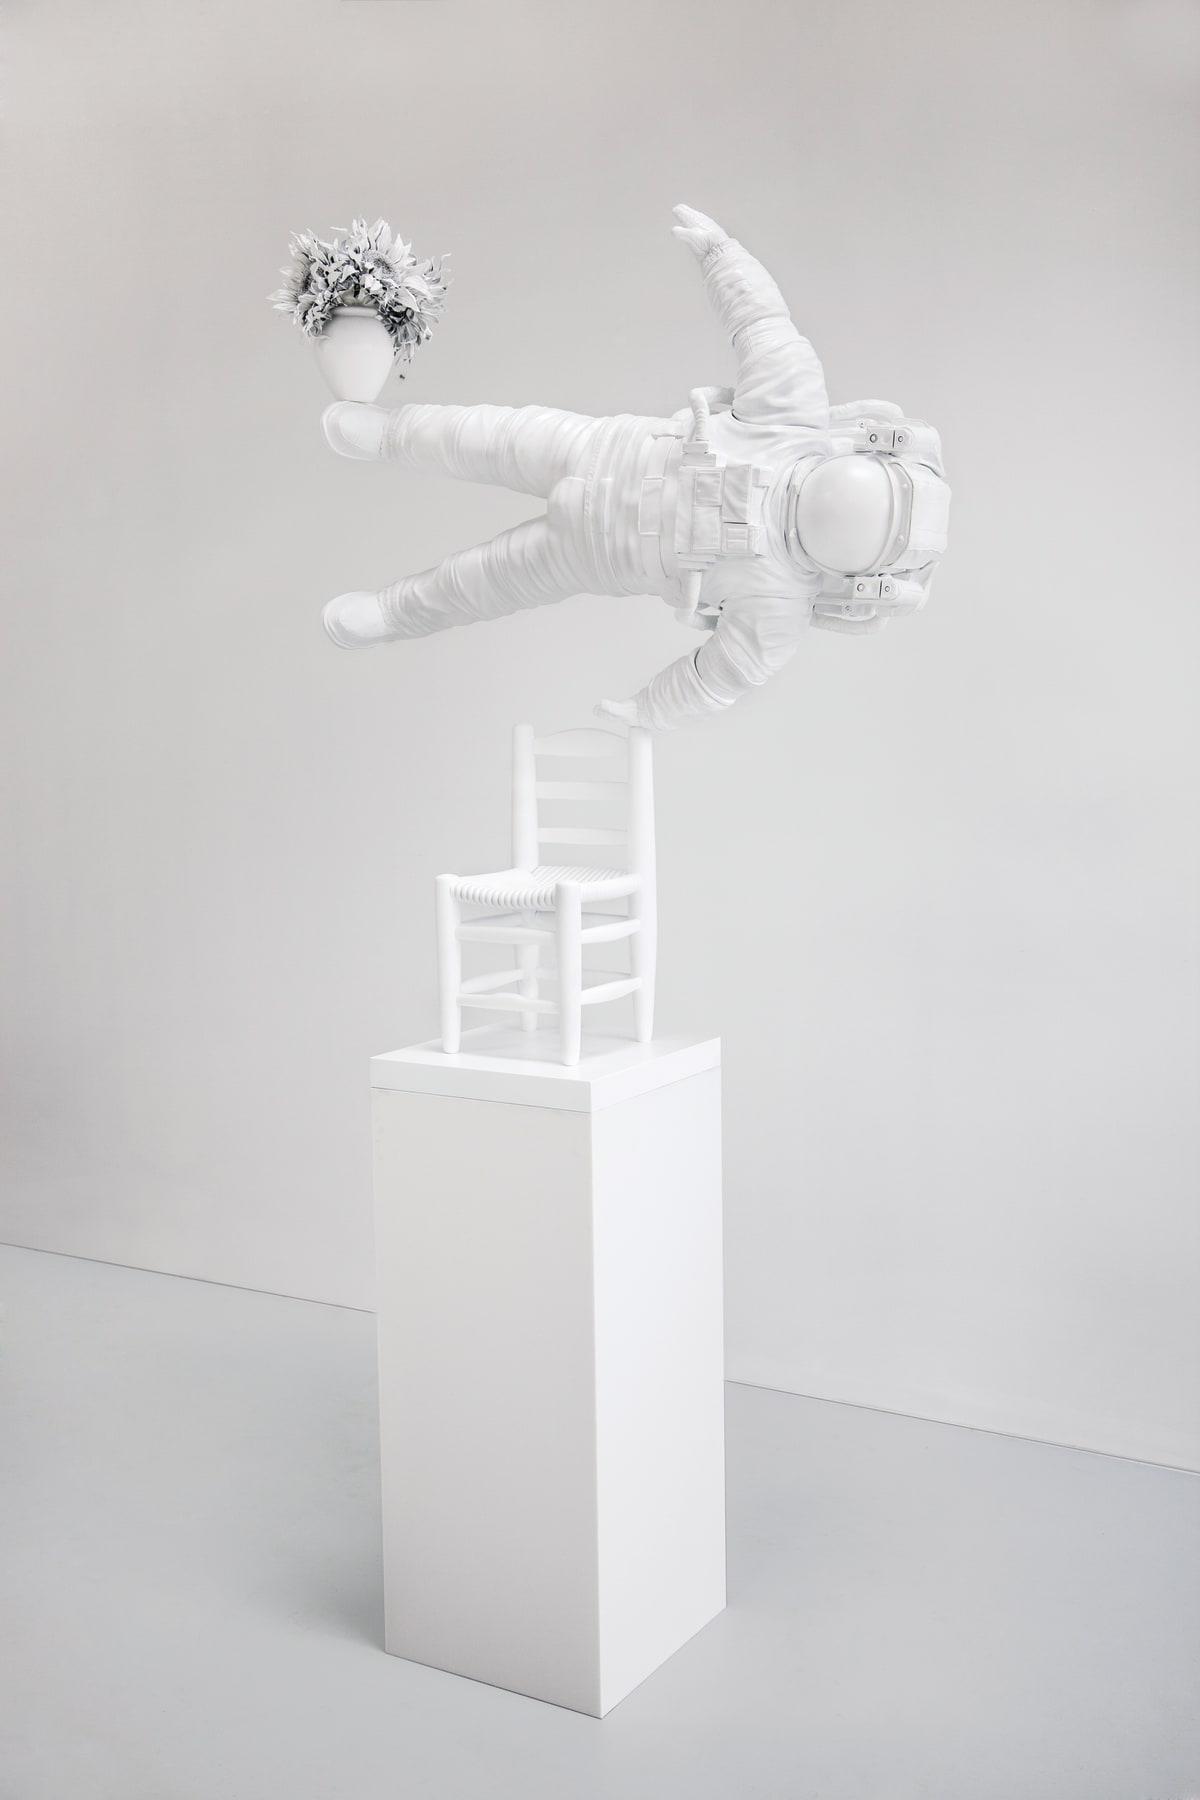 Joseph Klibansky, Self Portrait of a Dreamer , 2019